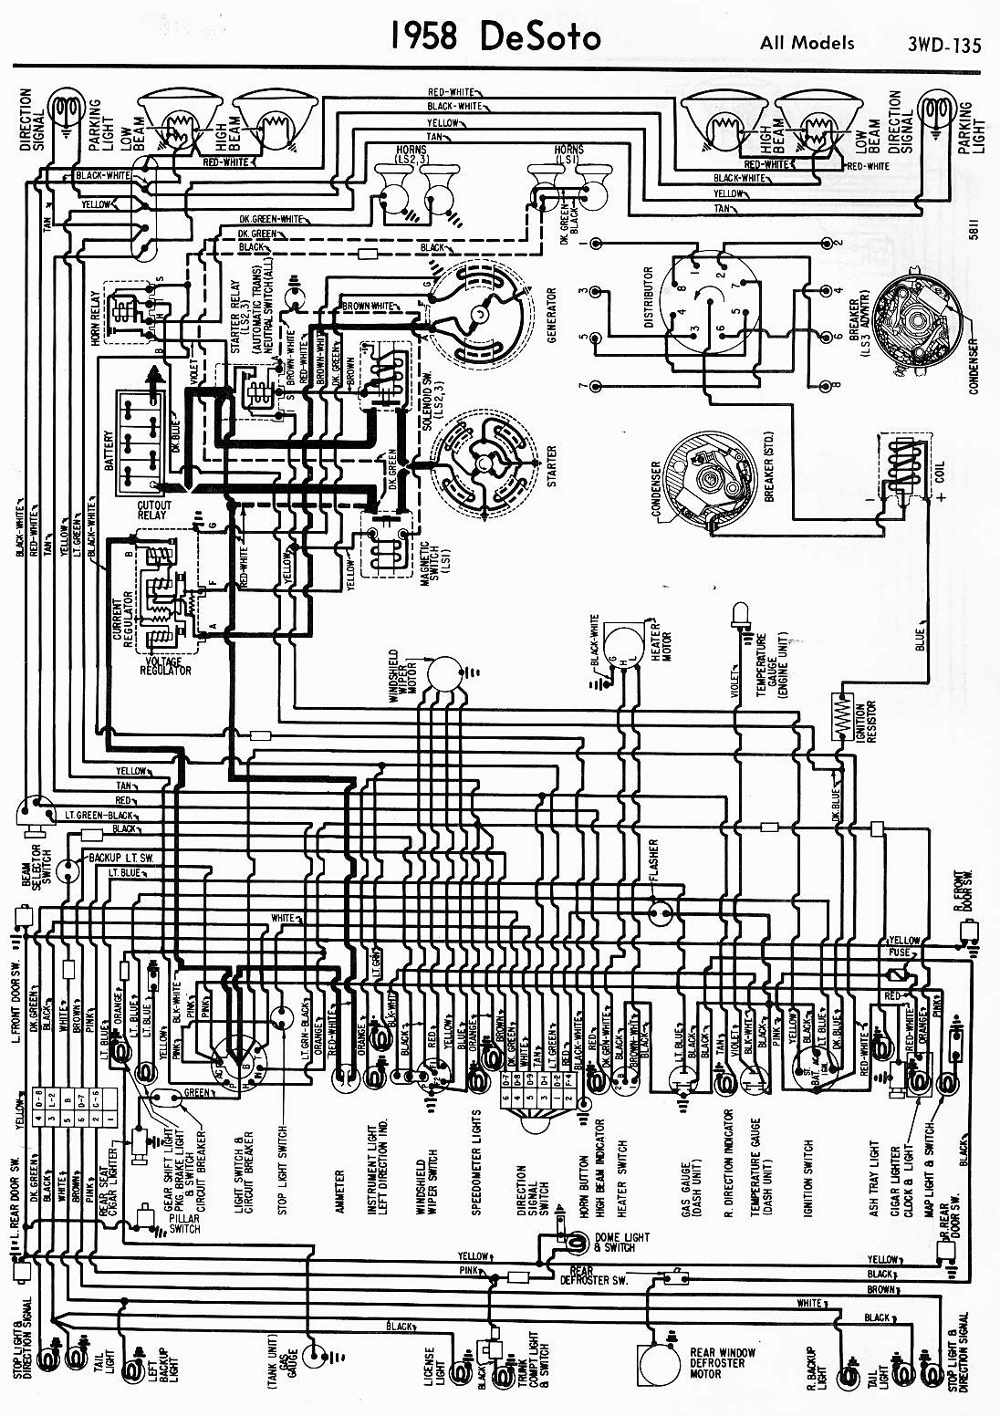 de soto car manuals wiring diagrams pdf fault codes rh automotive manuals net 1958 DeSoto 1957 DeSoto